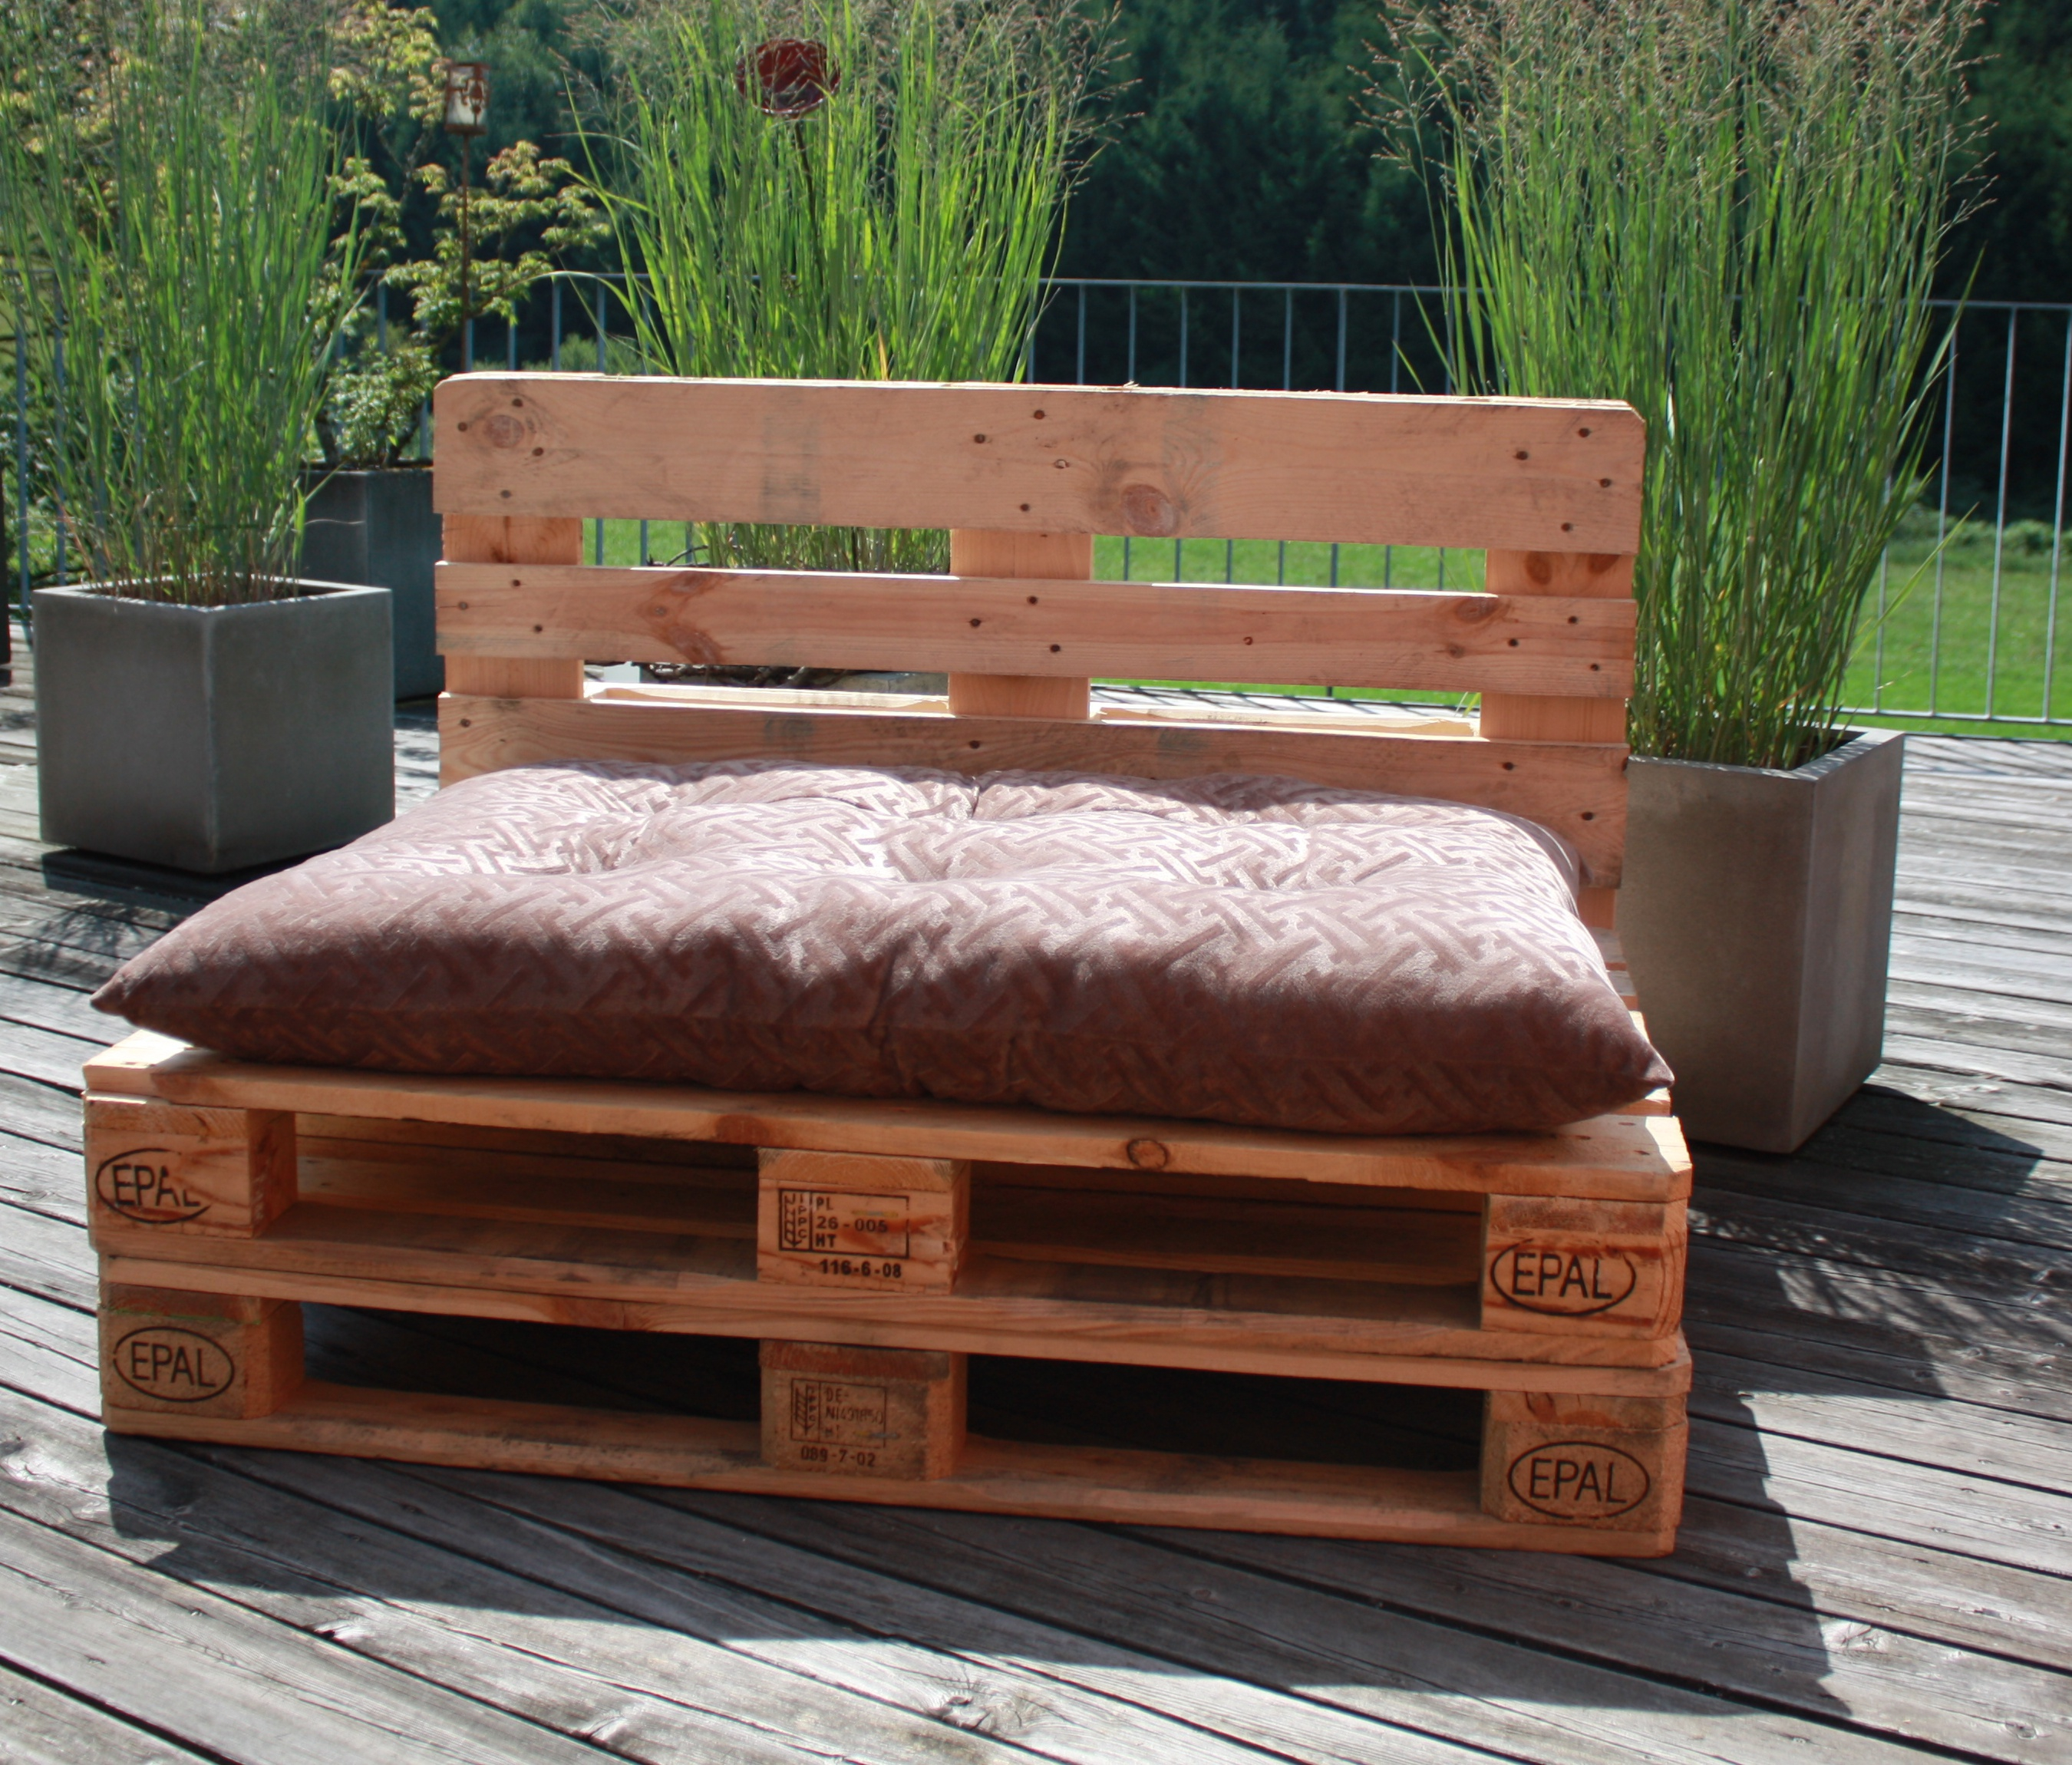 palettenkissen chill kissen f r europaletten 120x80x12 ebay. Black Bedroom Furniture Sets. Home Design Ideas